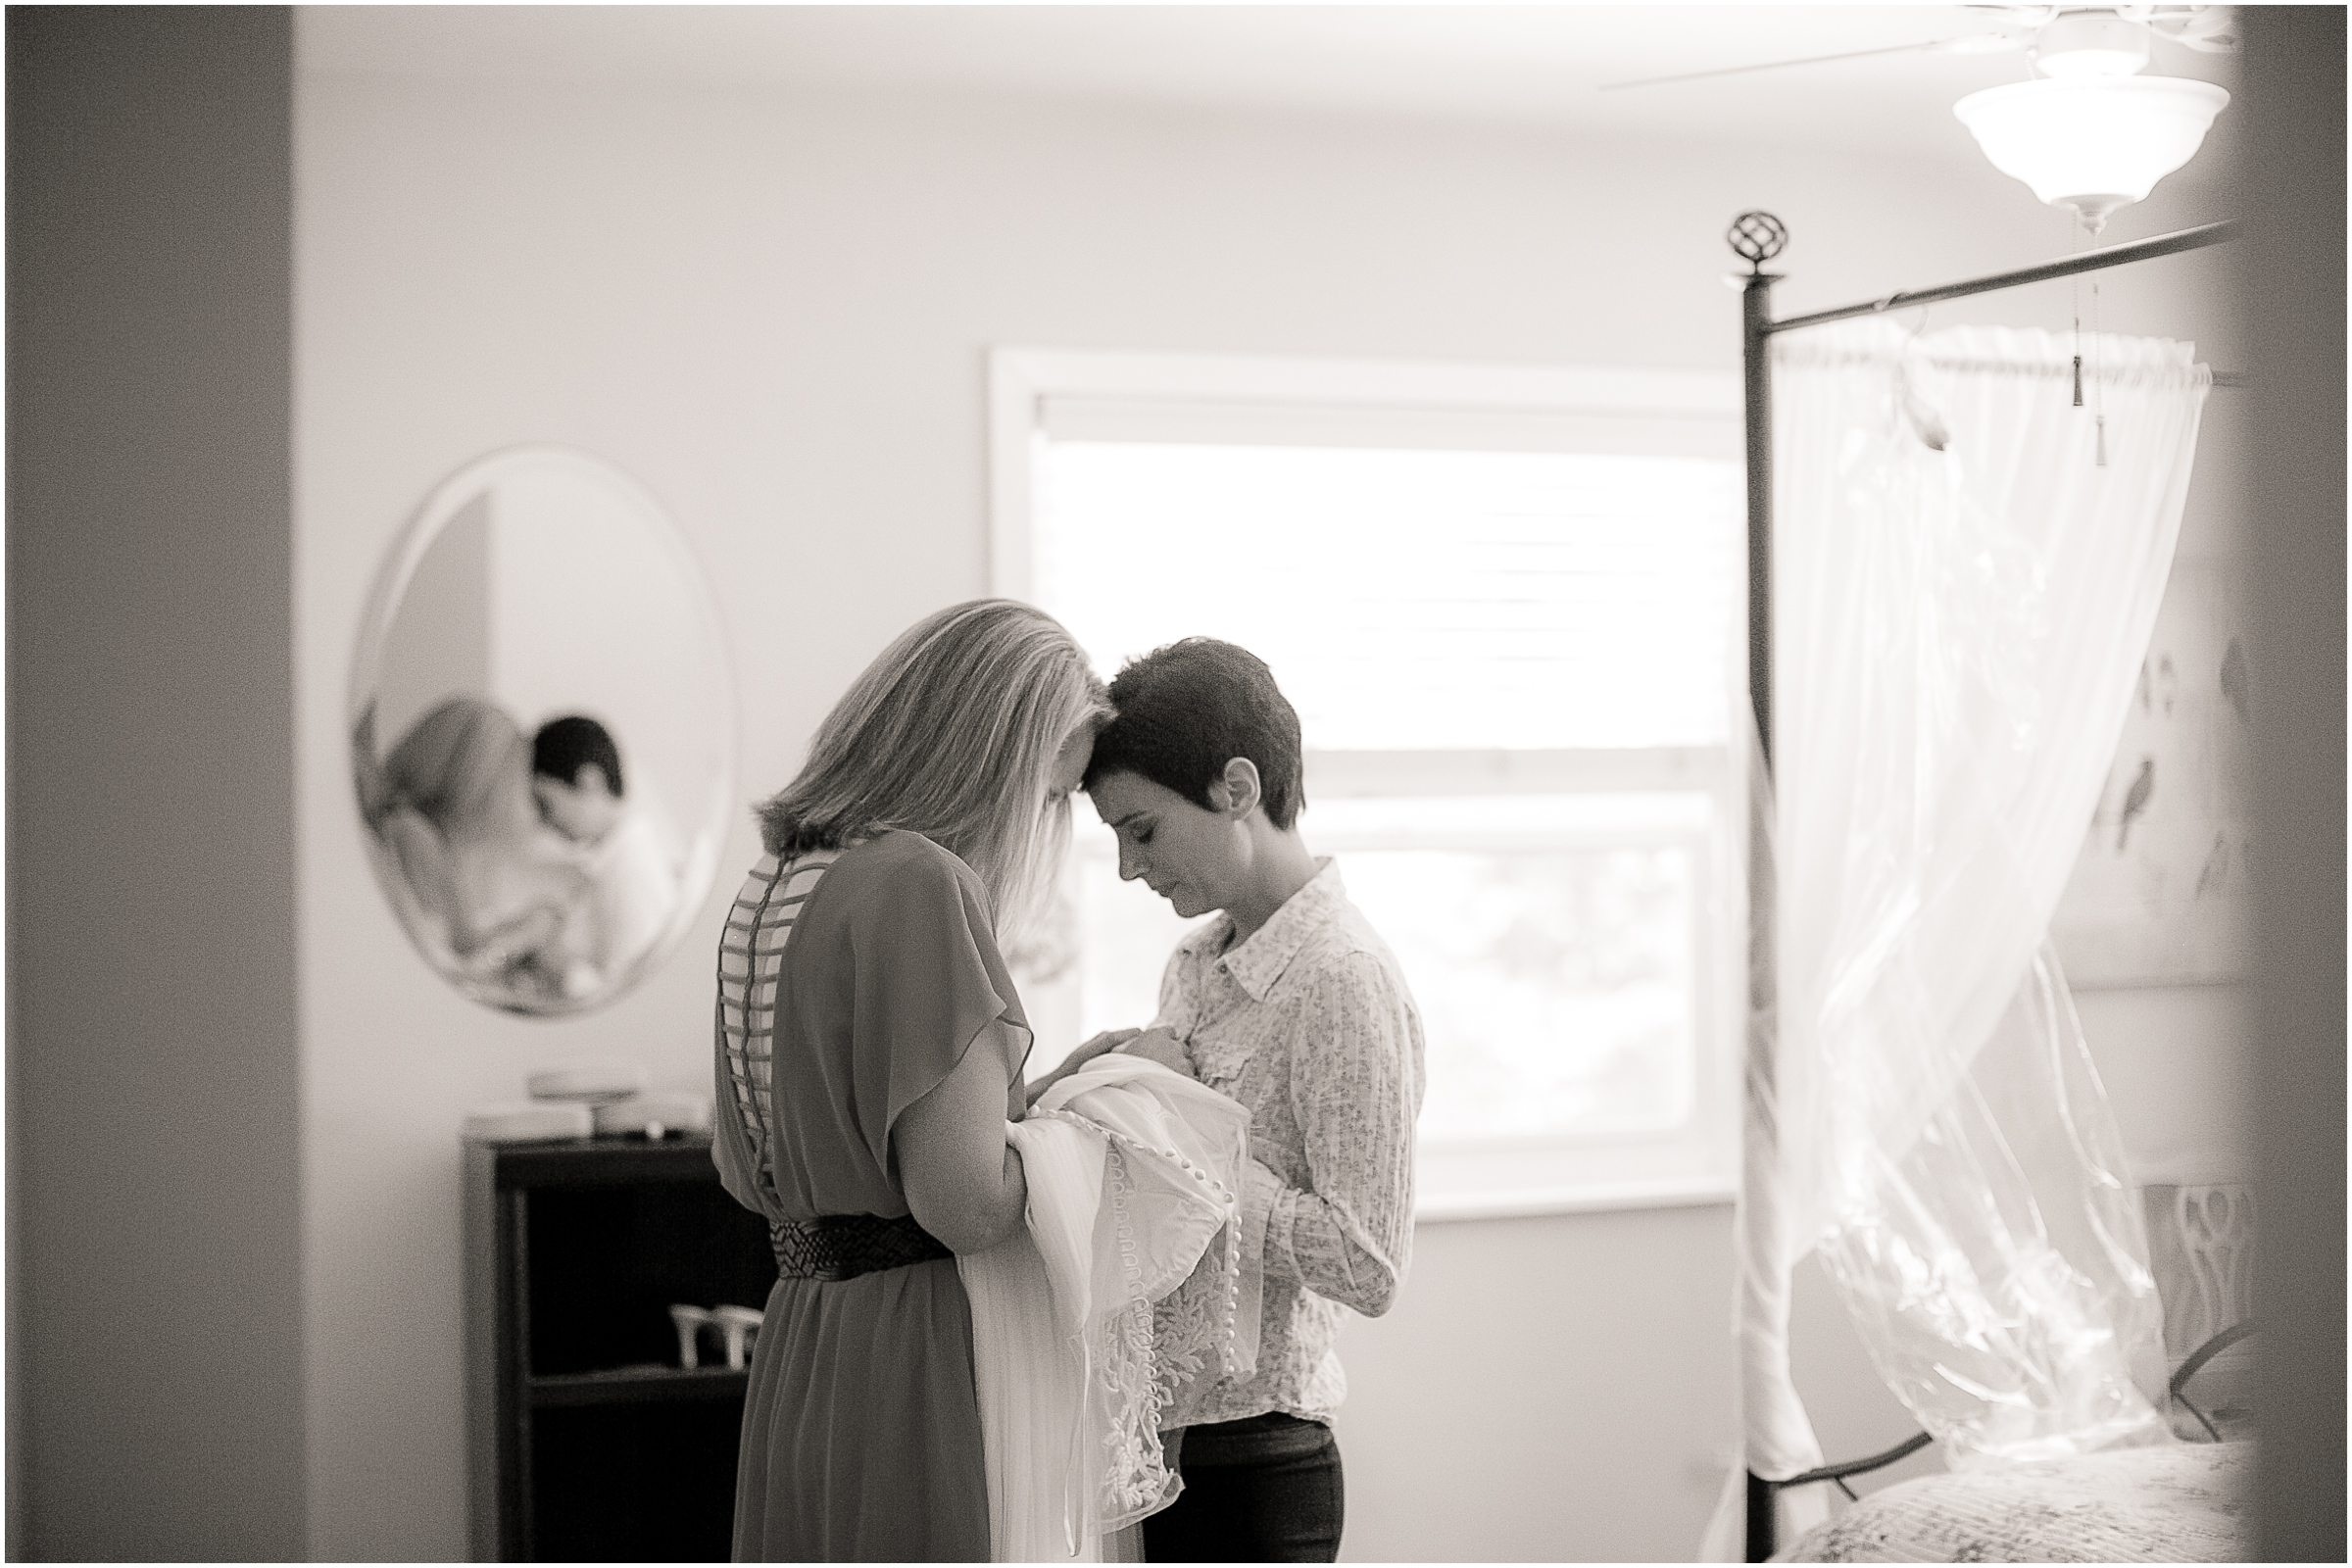 JennaBethPhotography-KAWedding-3.jpg